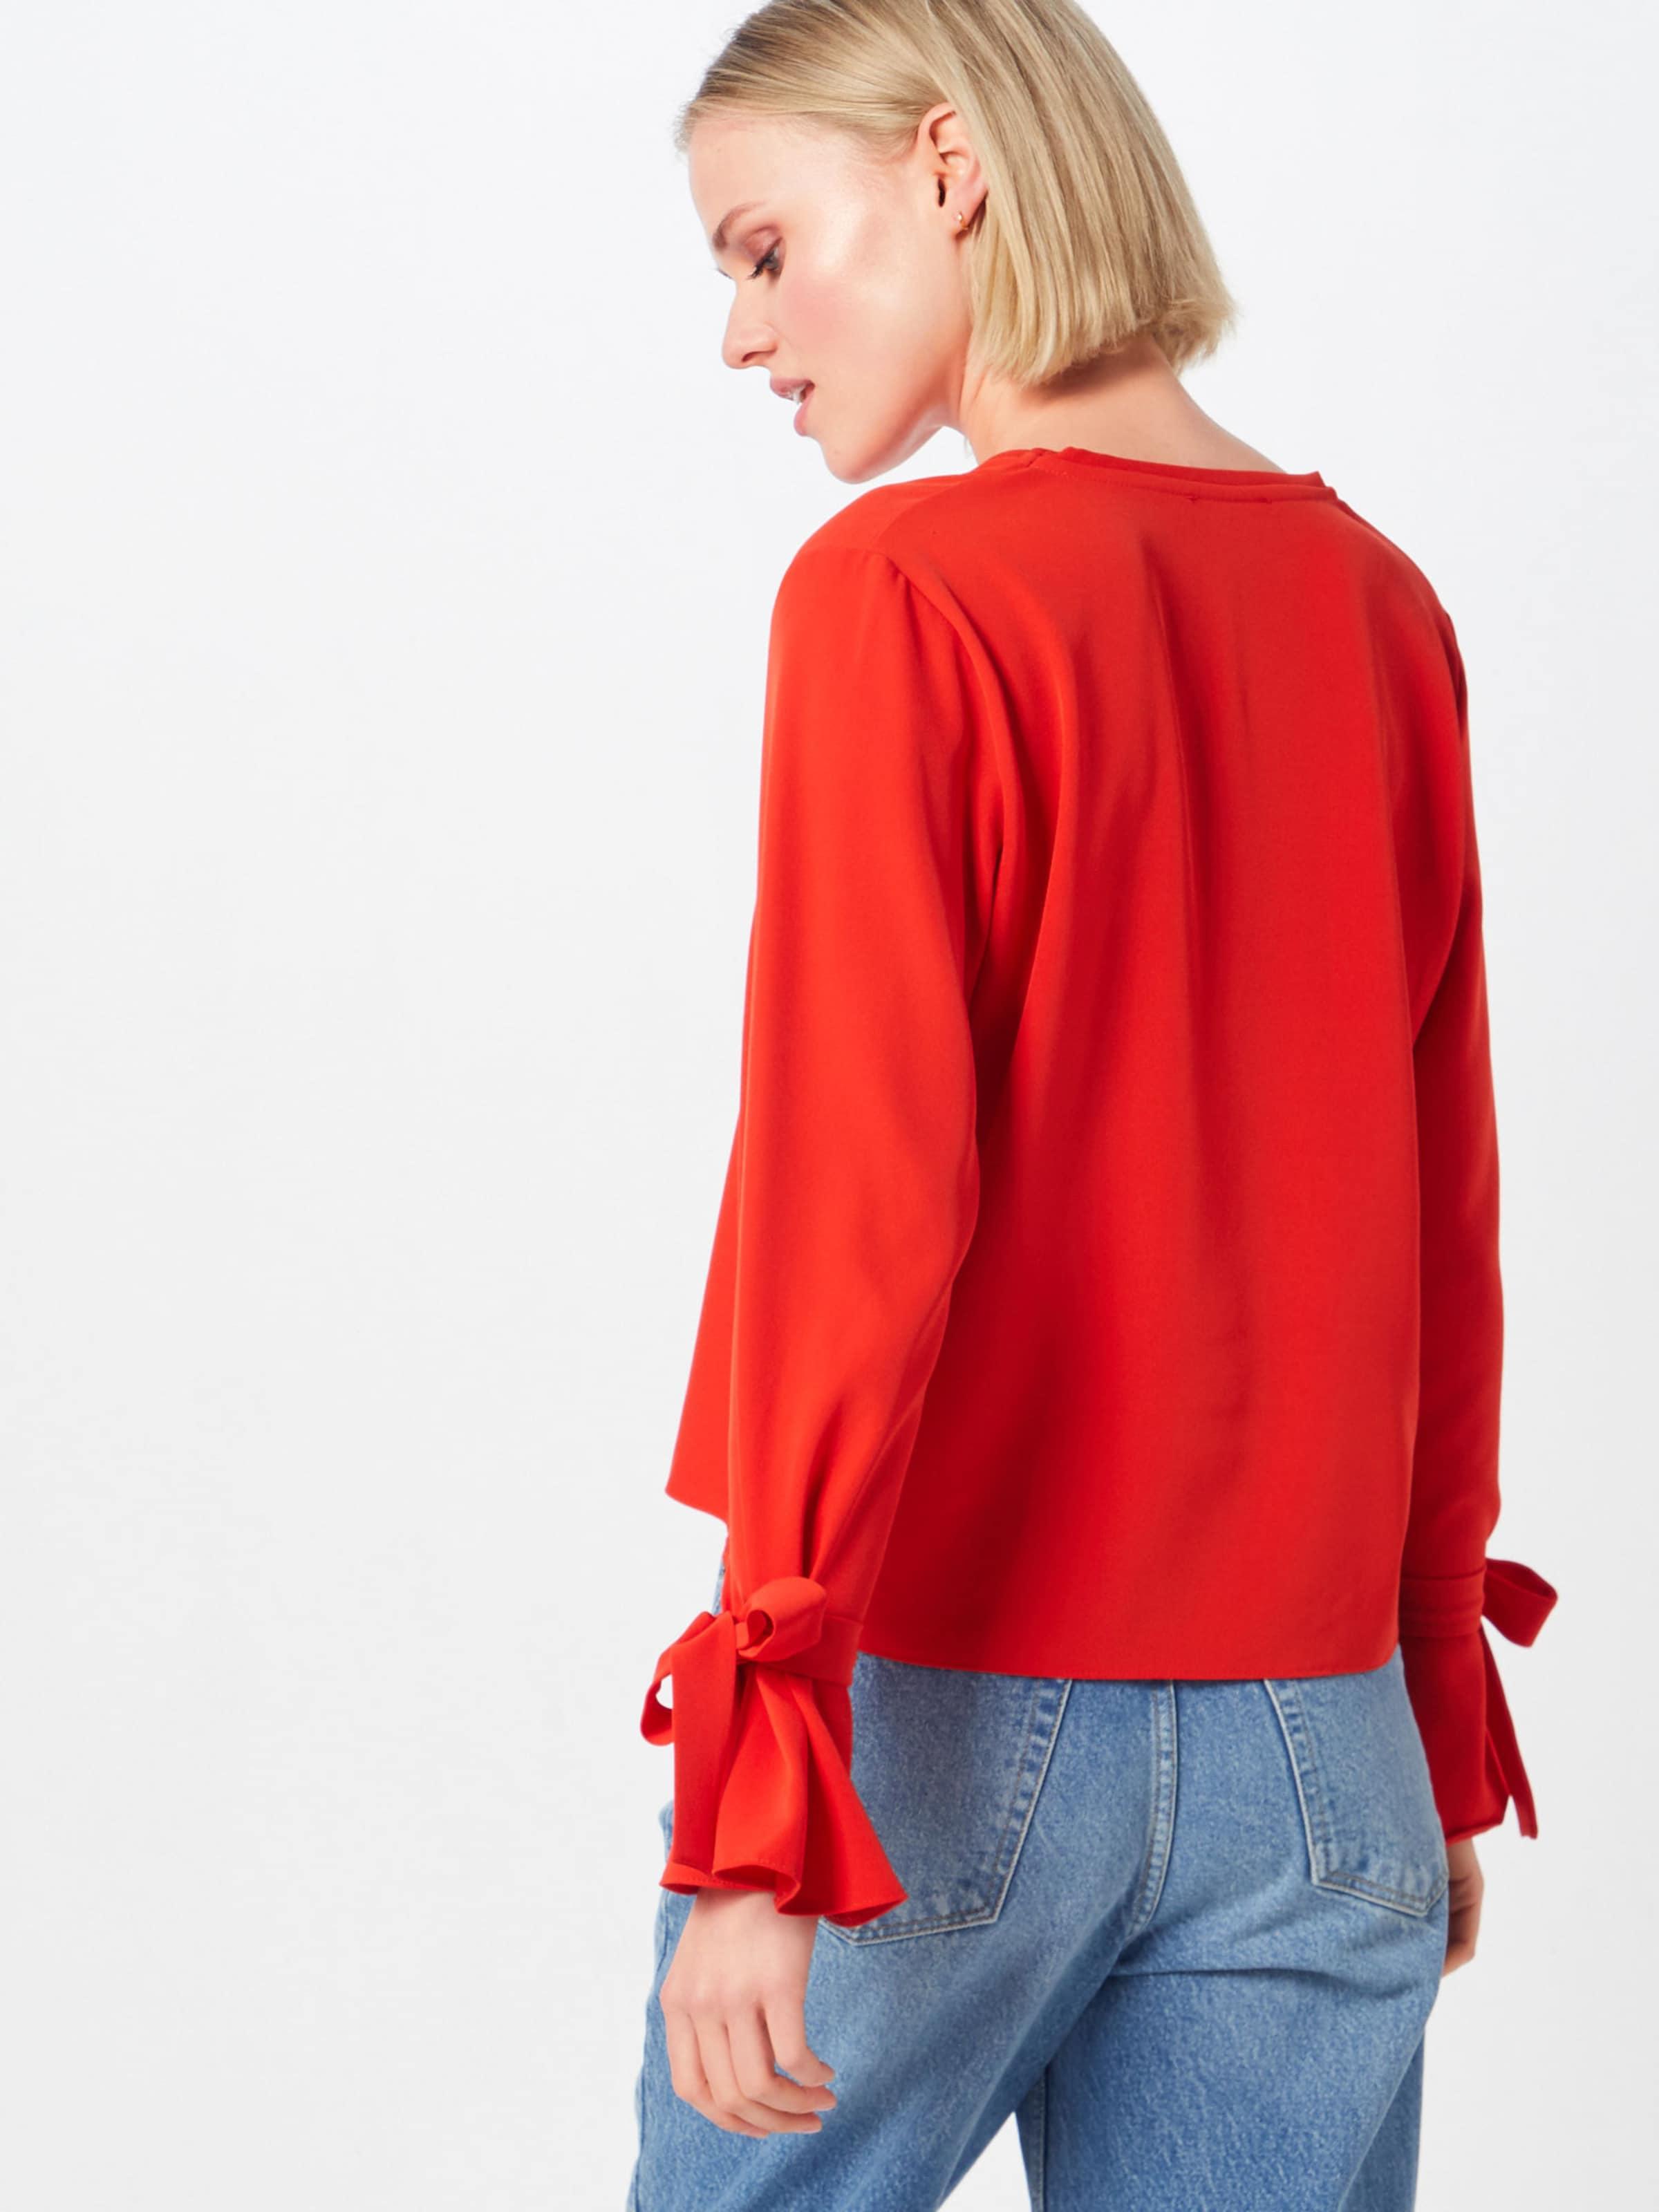 Lena Gercke 'lene' Bluse In Leger By Koralle WDIYeEH29b